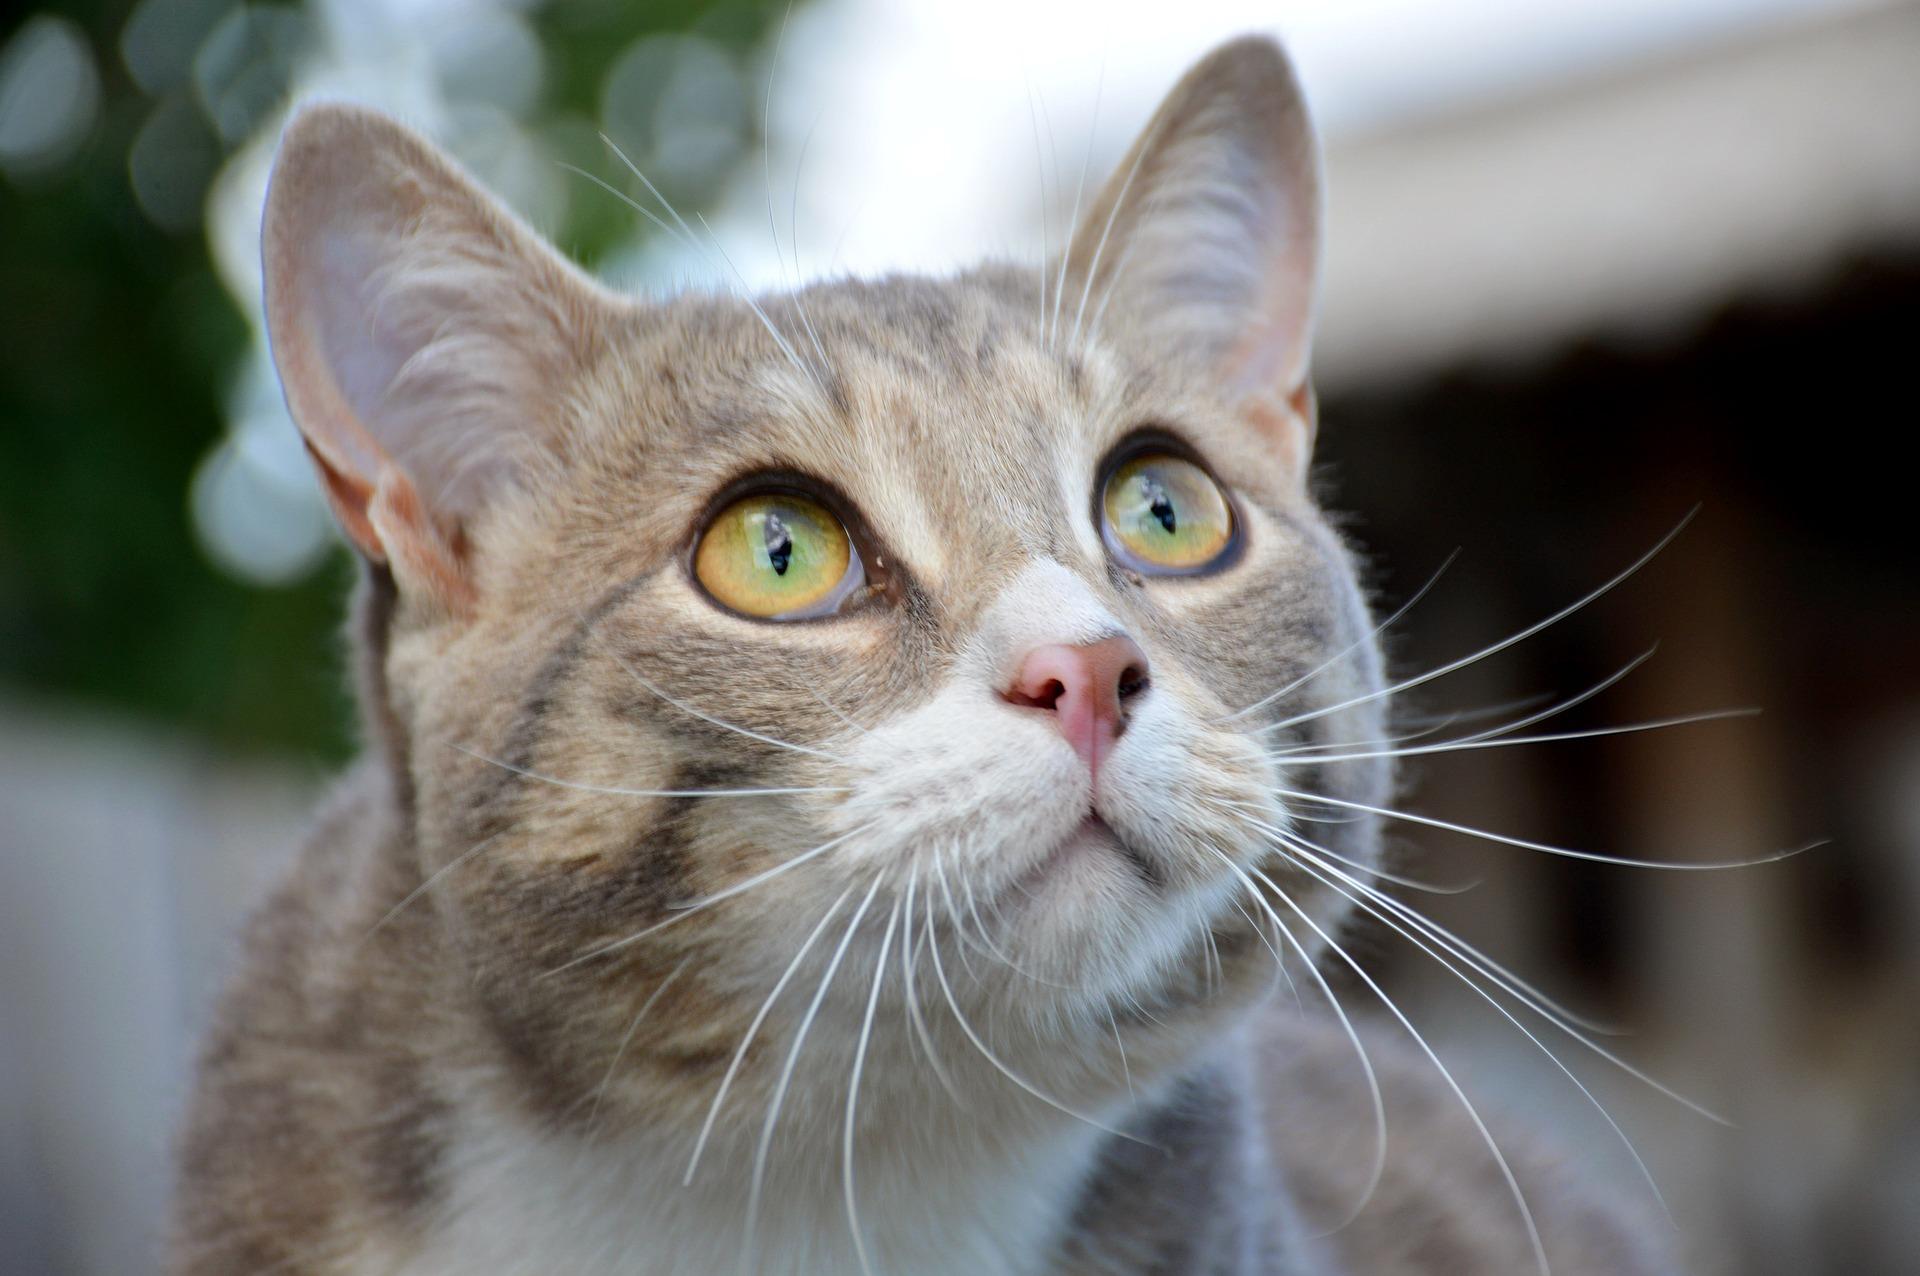 Felino passando por adestramento de gatos